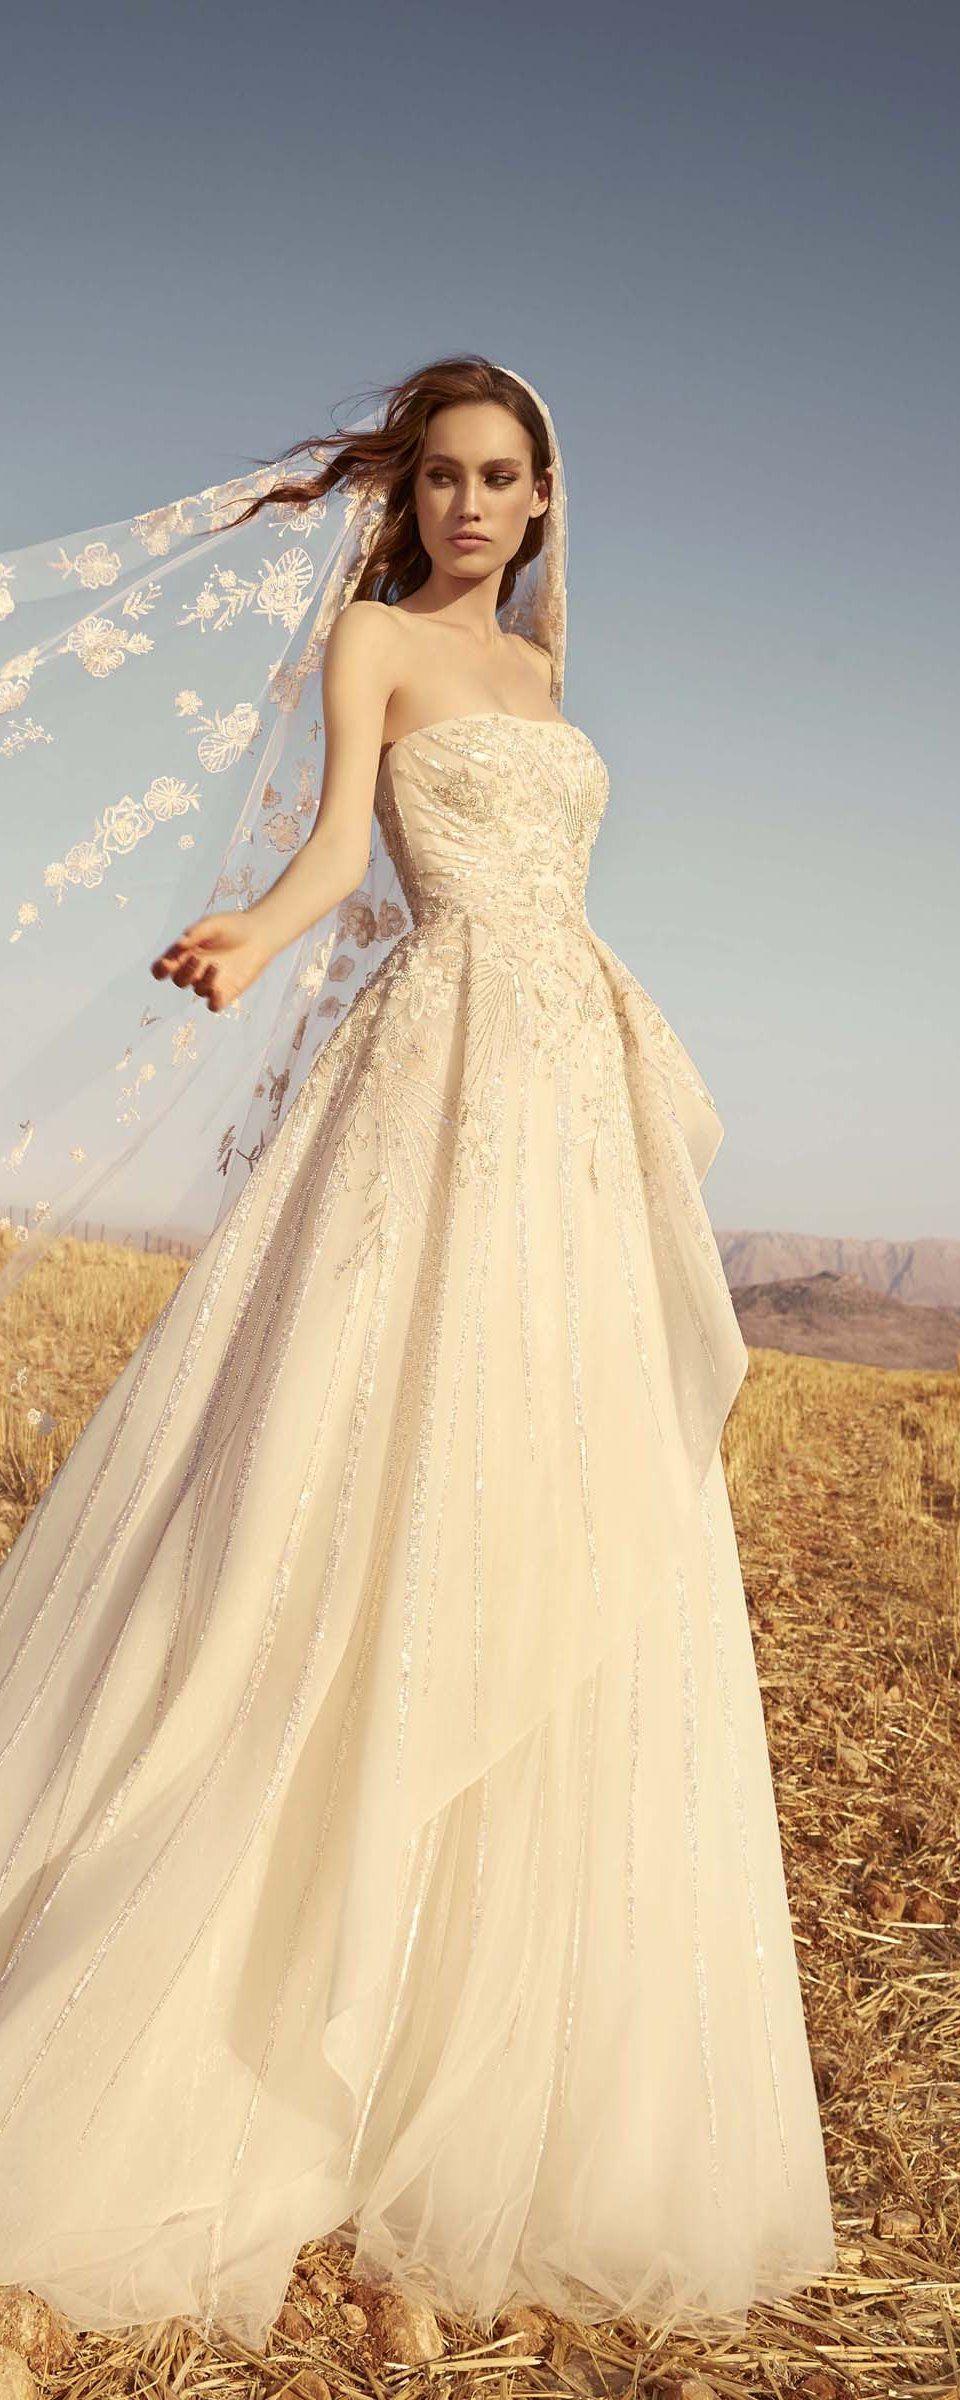 Zuhair Murad Bridal 2020 Bridal Designer Wedding Dresses Long Wedding Dresses Dresses